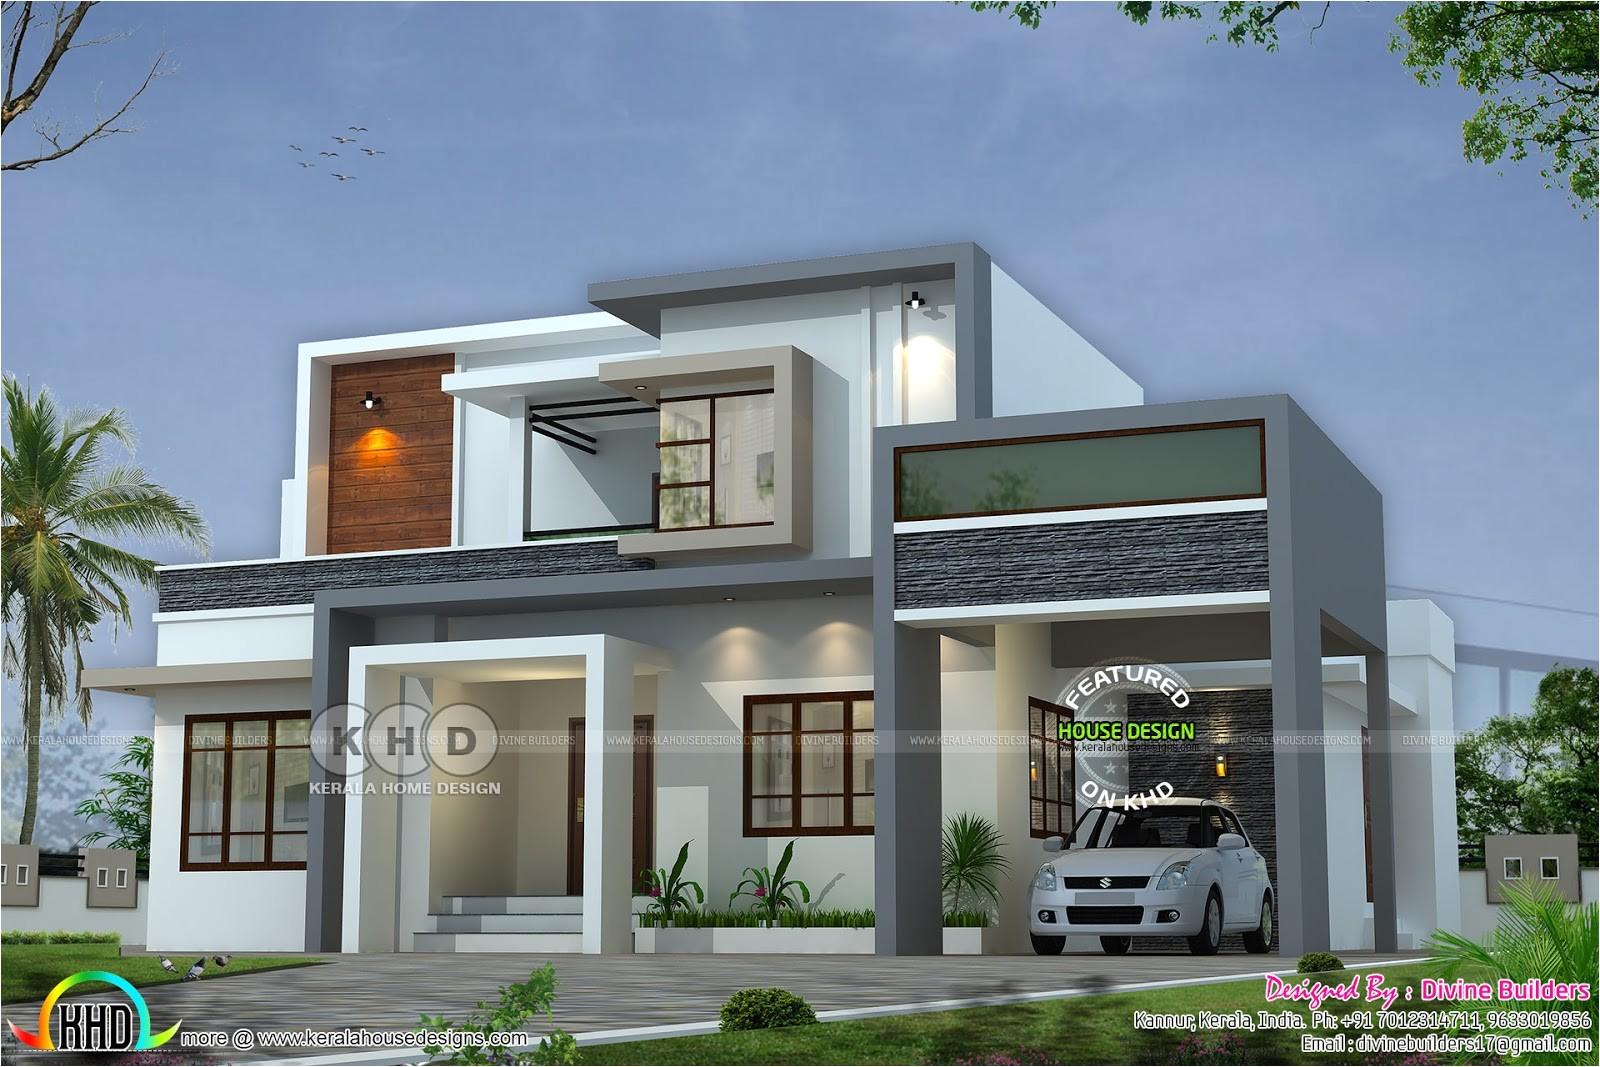 Architect Designed Home Plans 2017 Kerala Home Design and Floor Plans